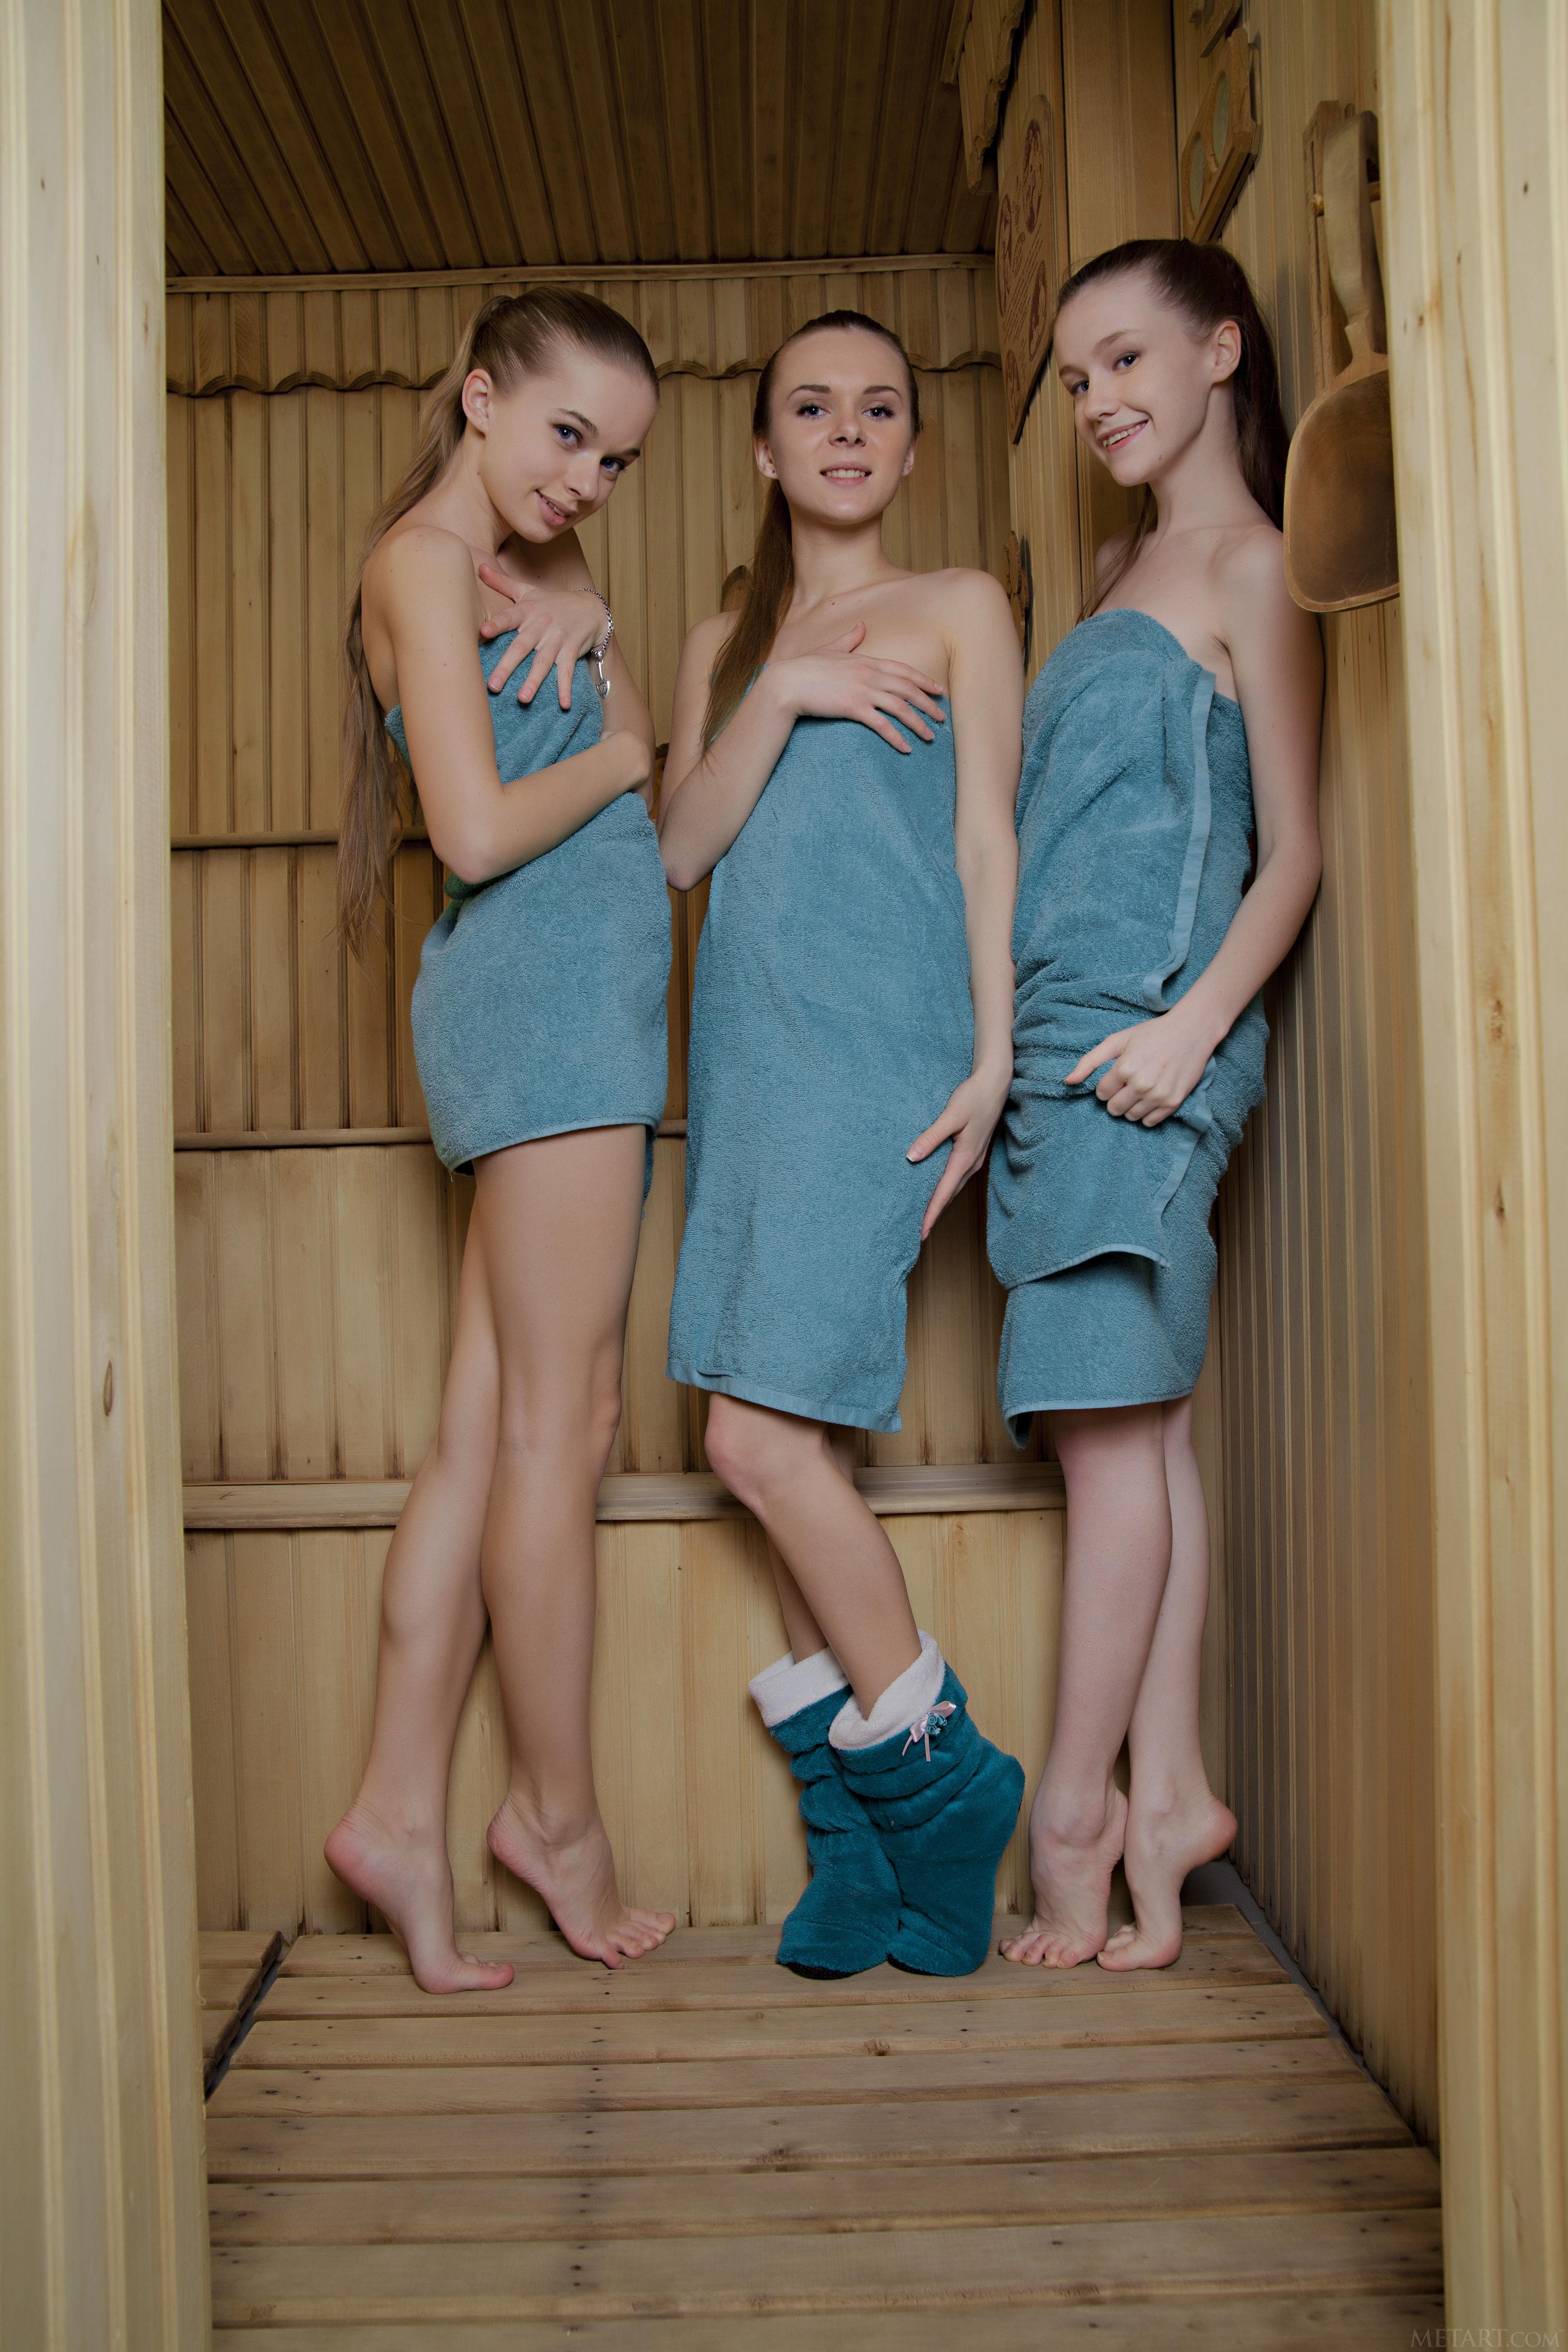 Sauna Teen Nude - Most Expensive Dildo